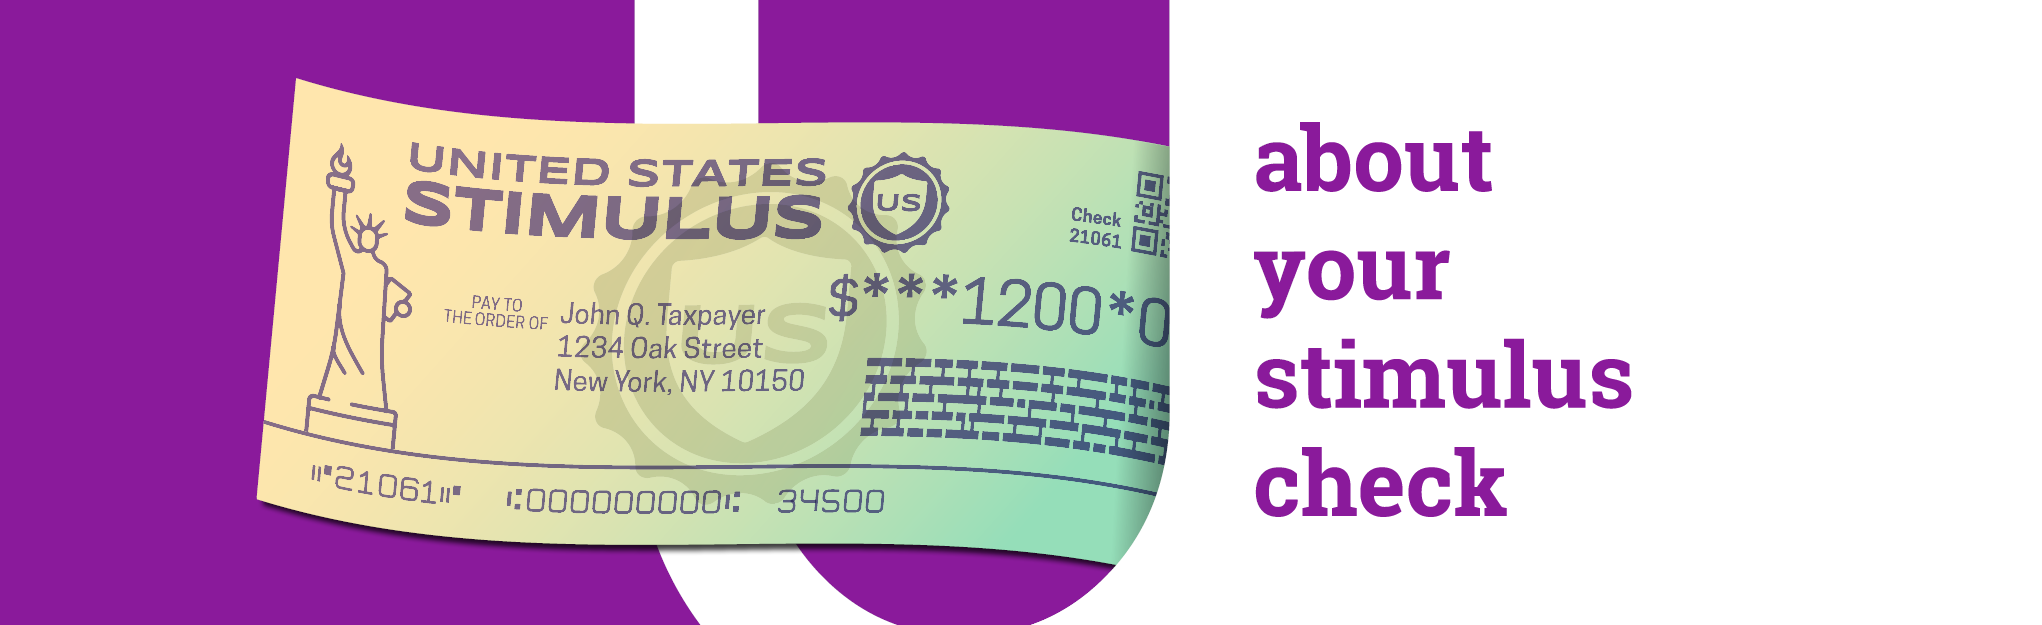 Second Round of Stimulus Checks | United